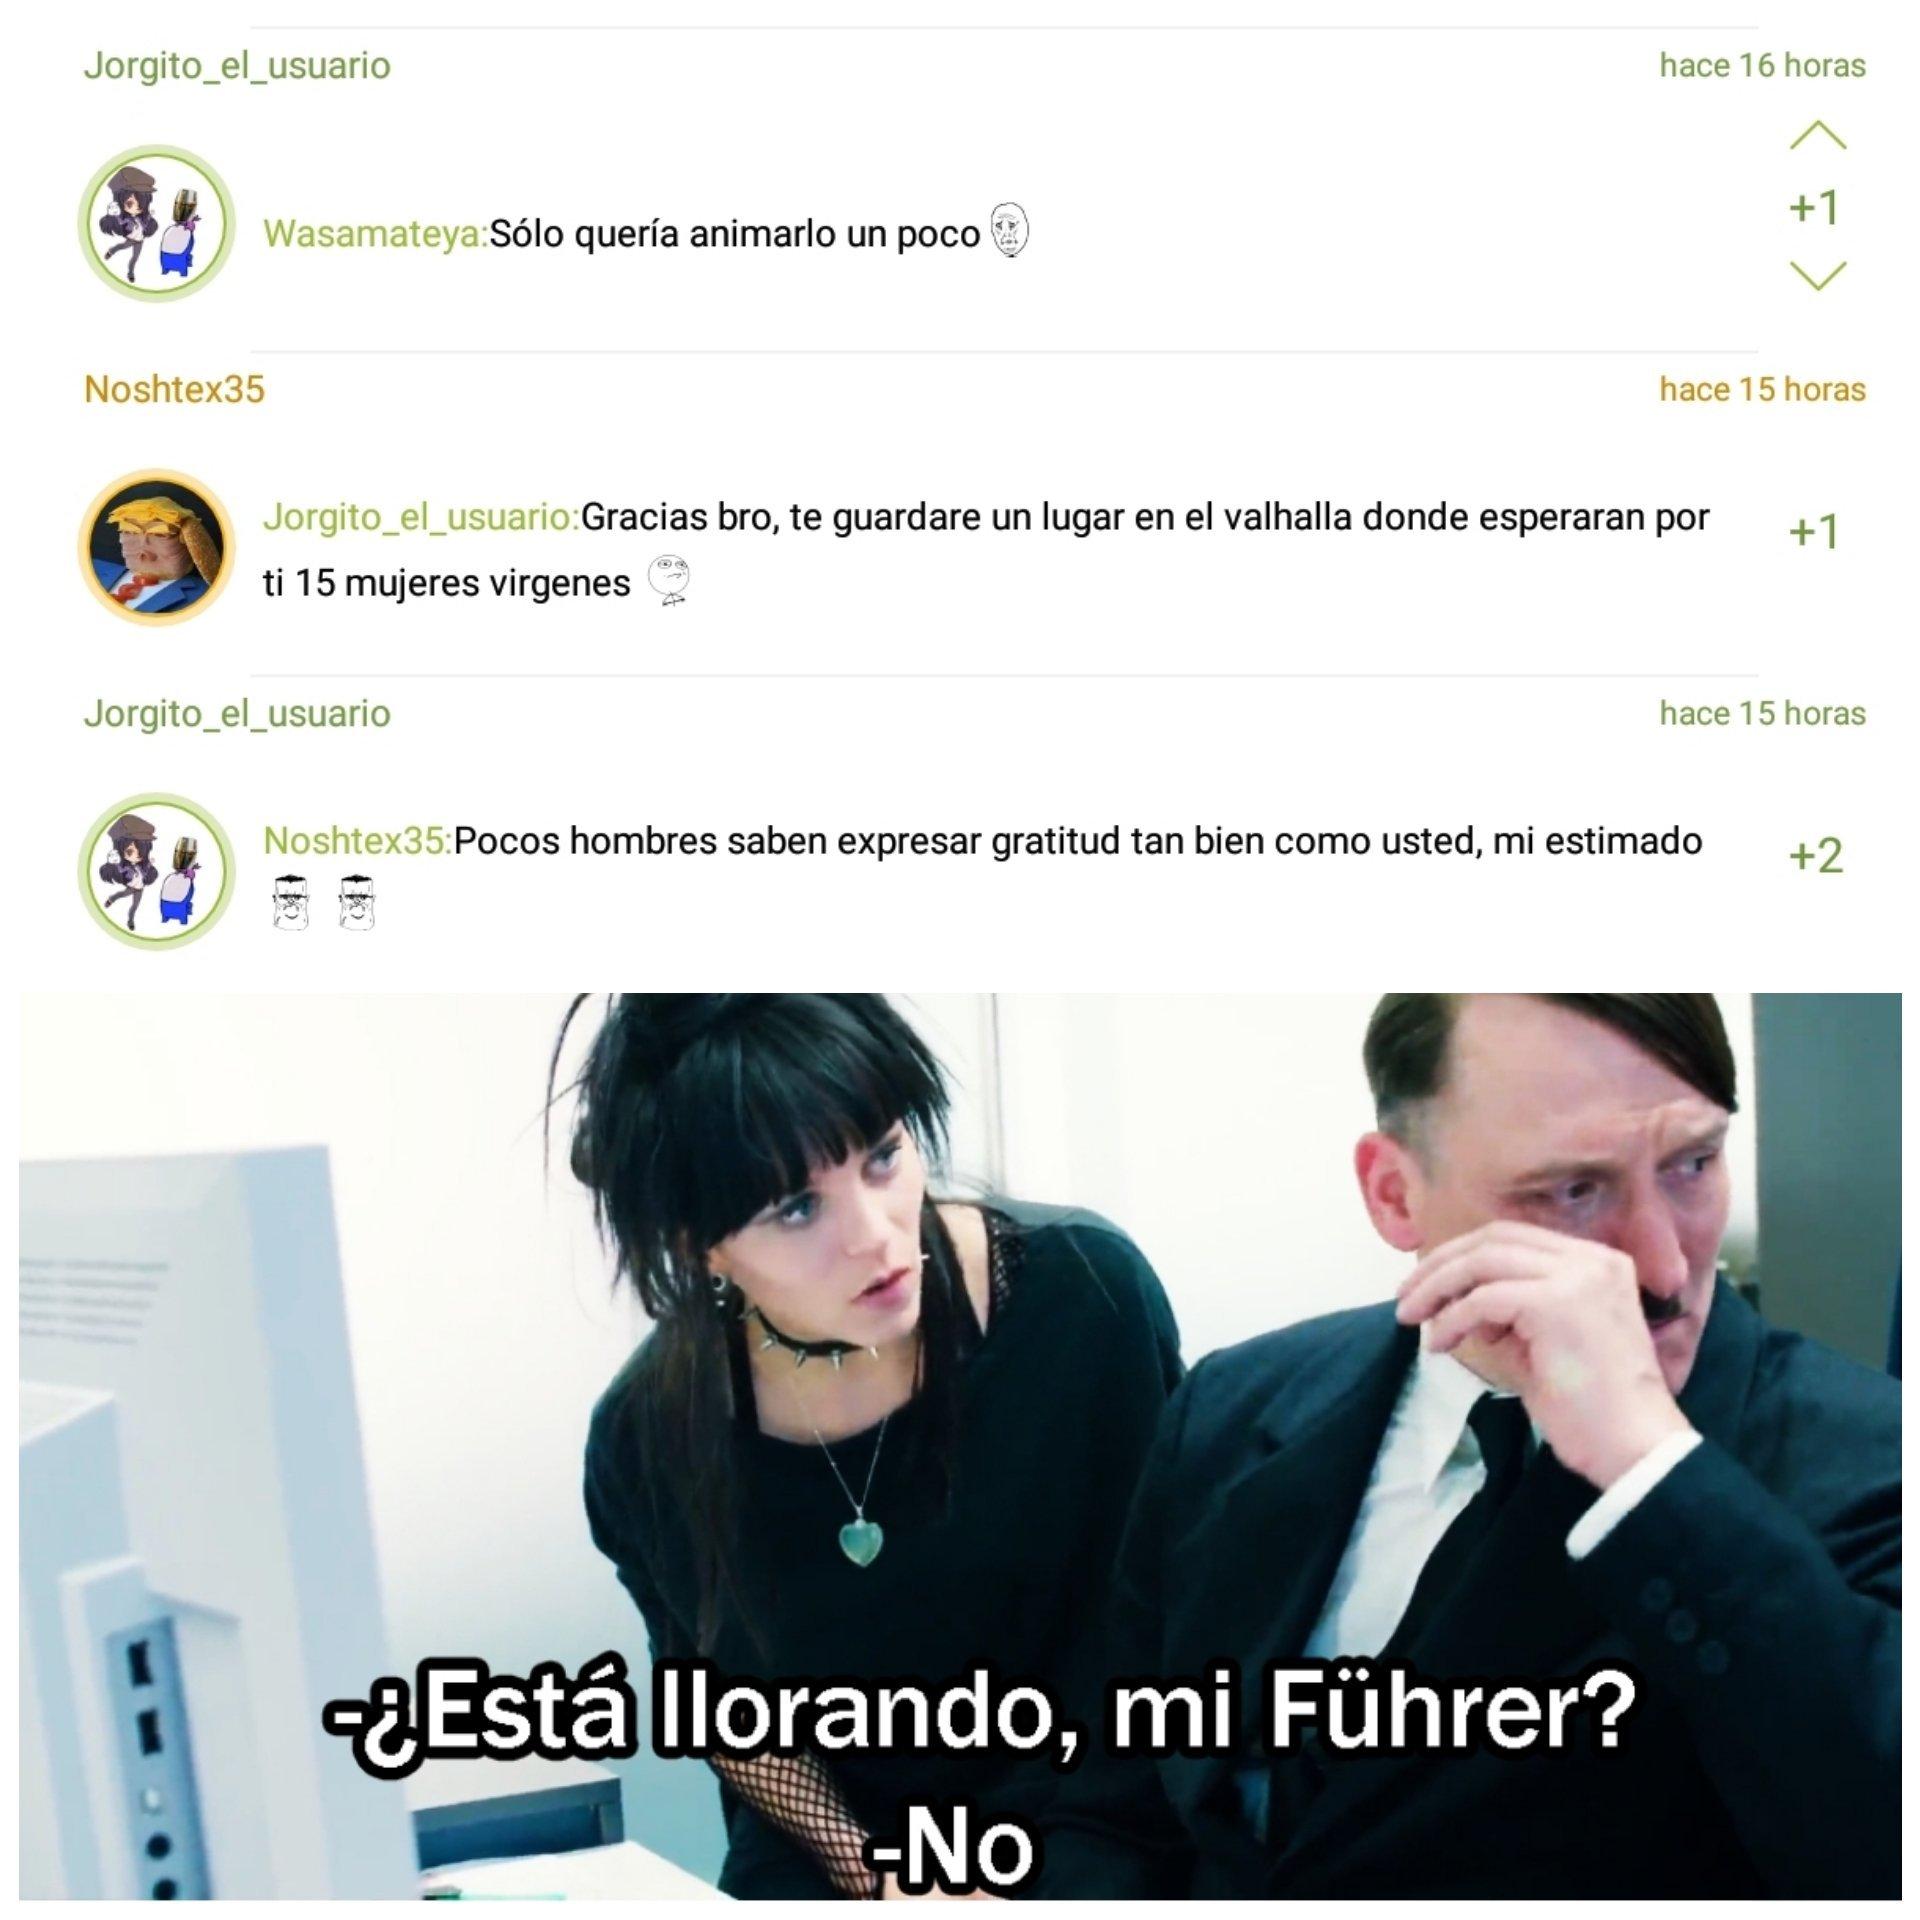 Mein Führer! - meme